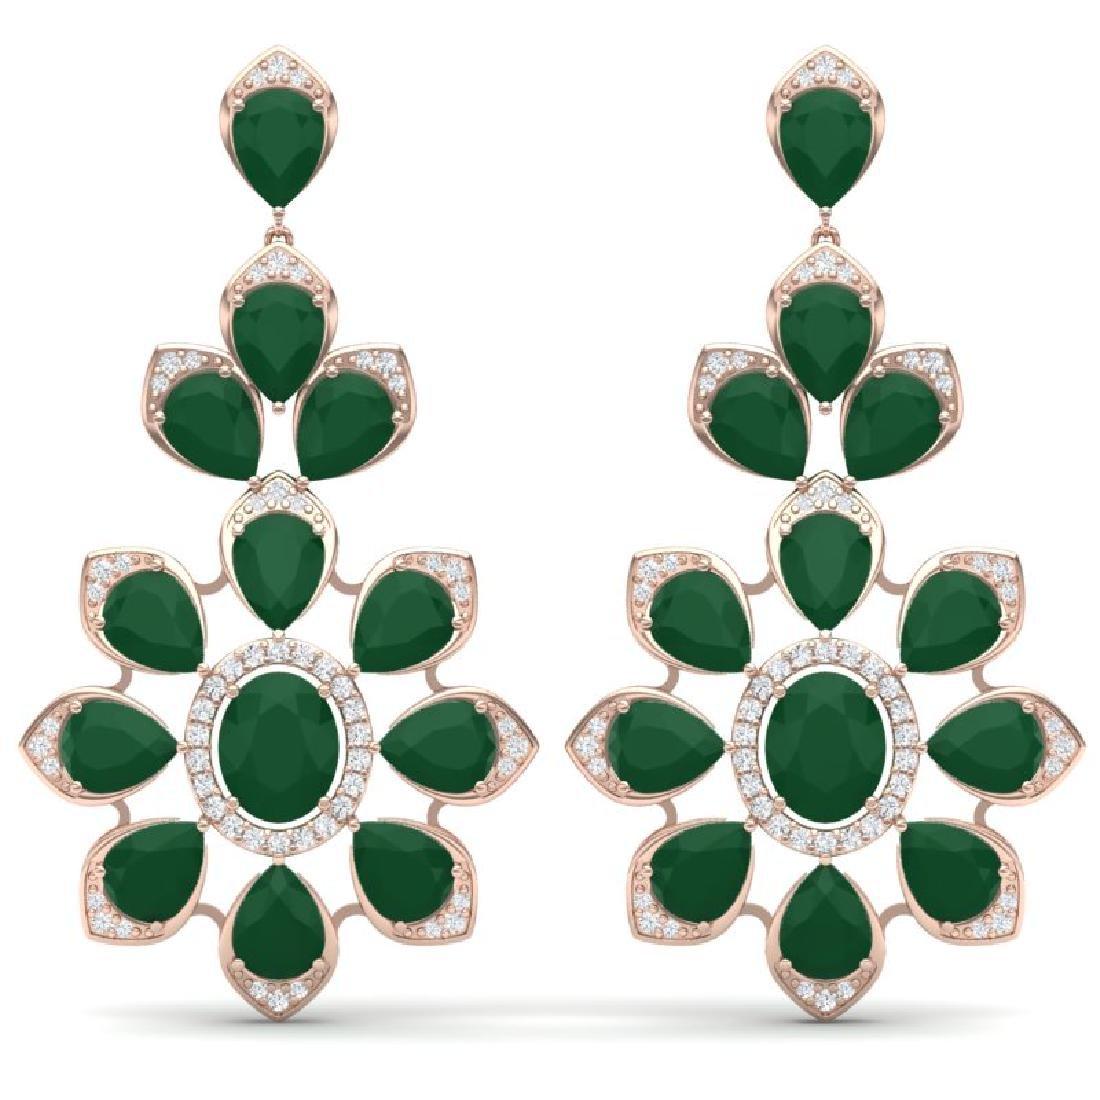 51.8 CTW Royalty Emerald & VS Diamond Earrings 18K Rose